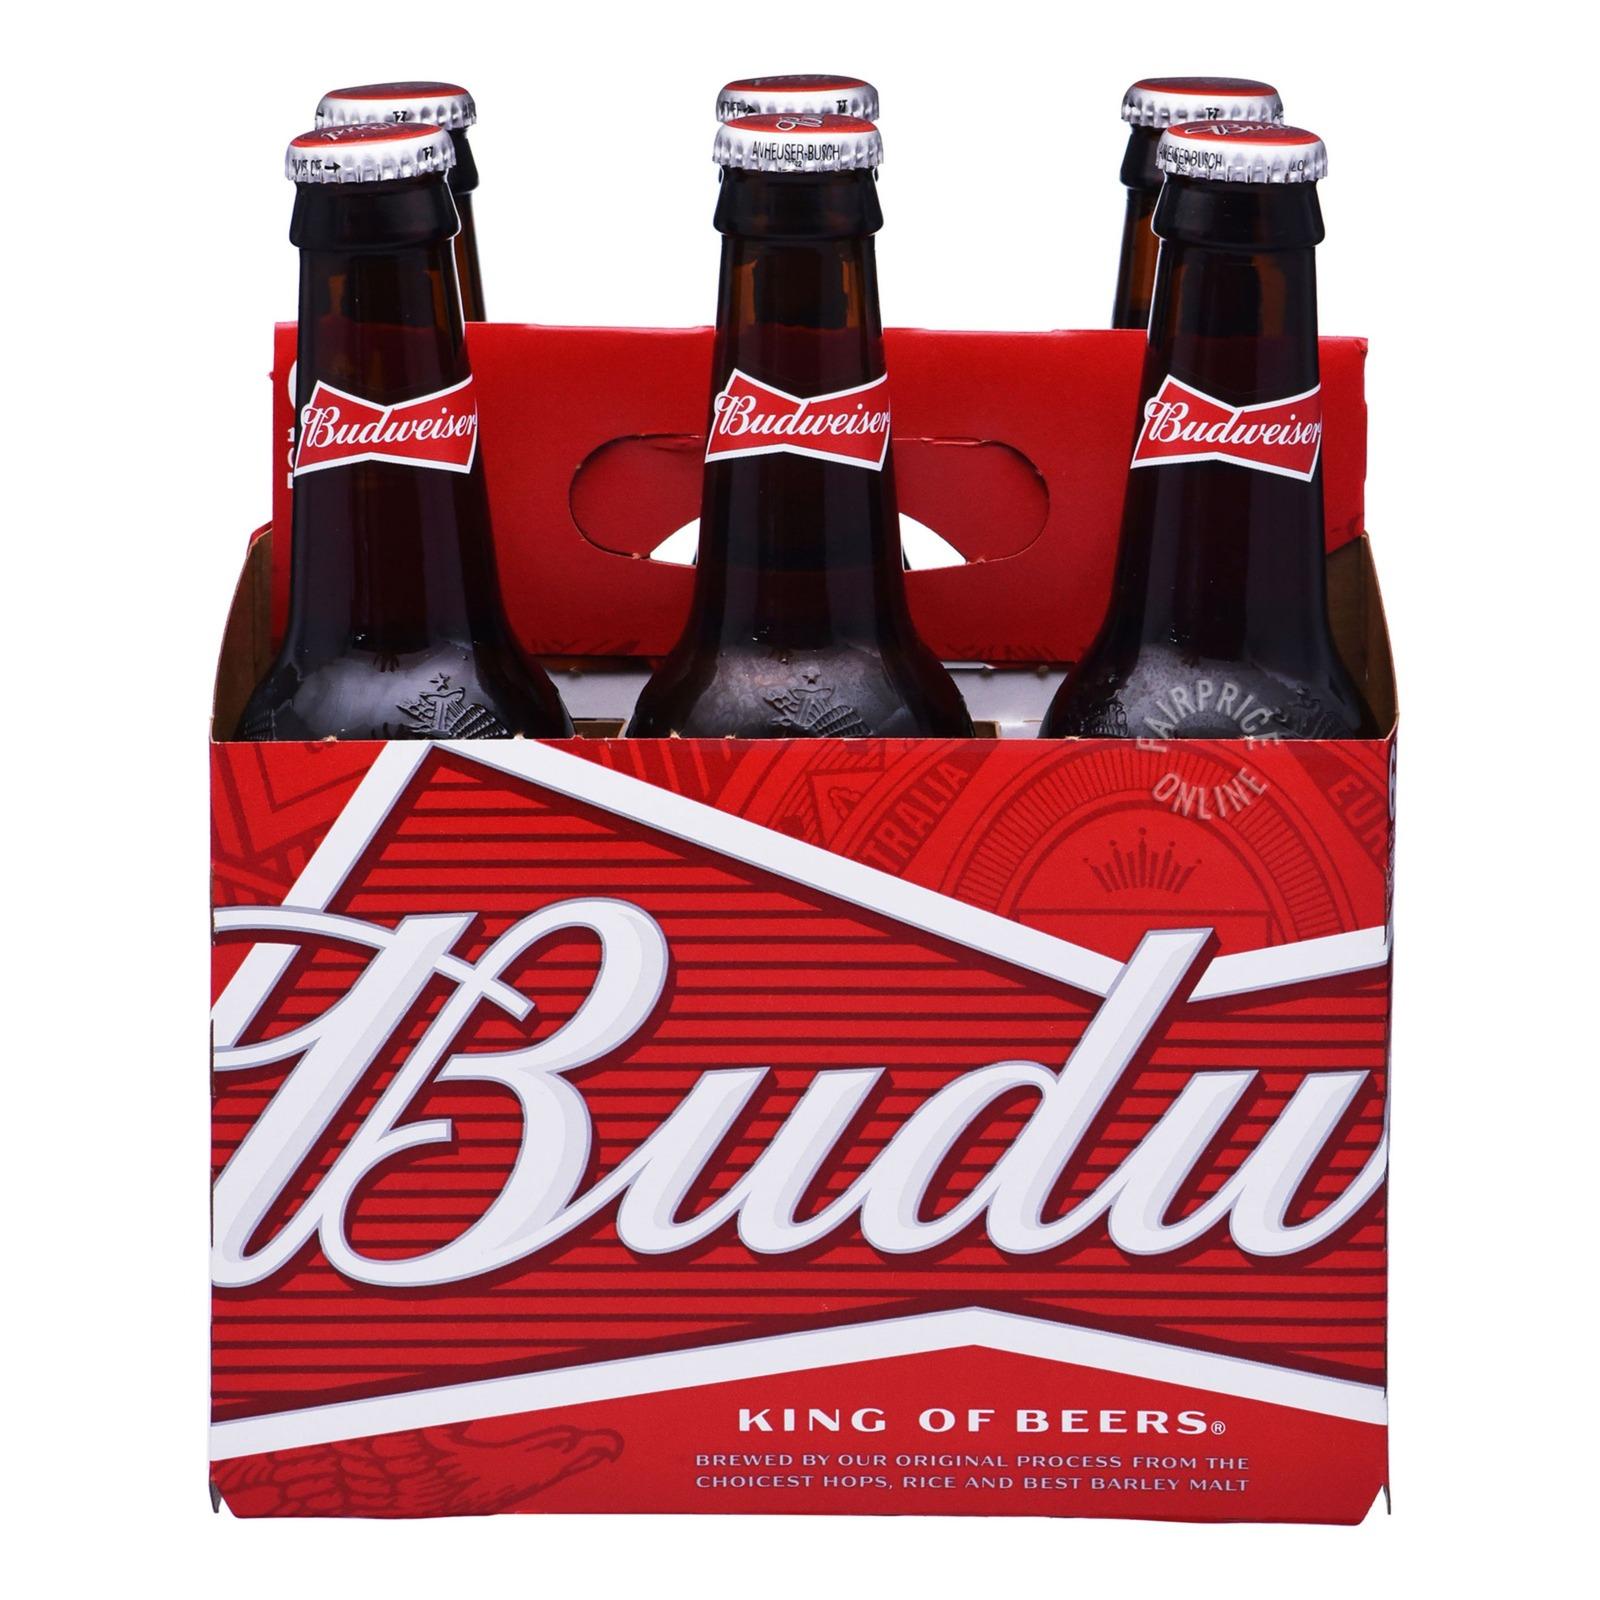 Budweiser Bottle Beer